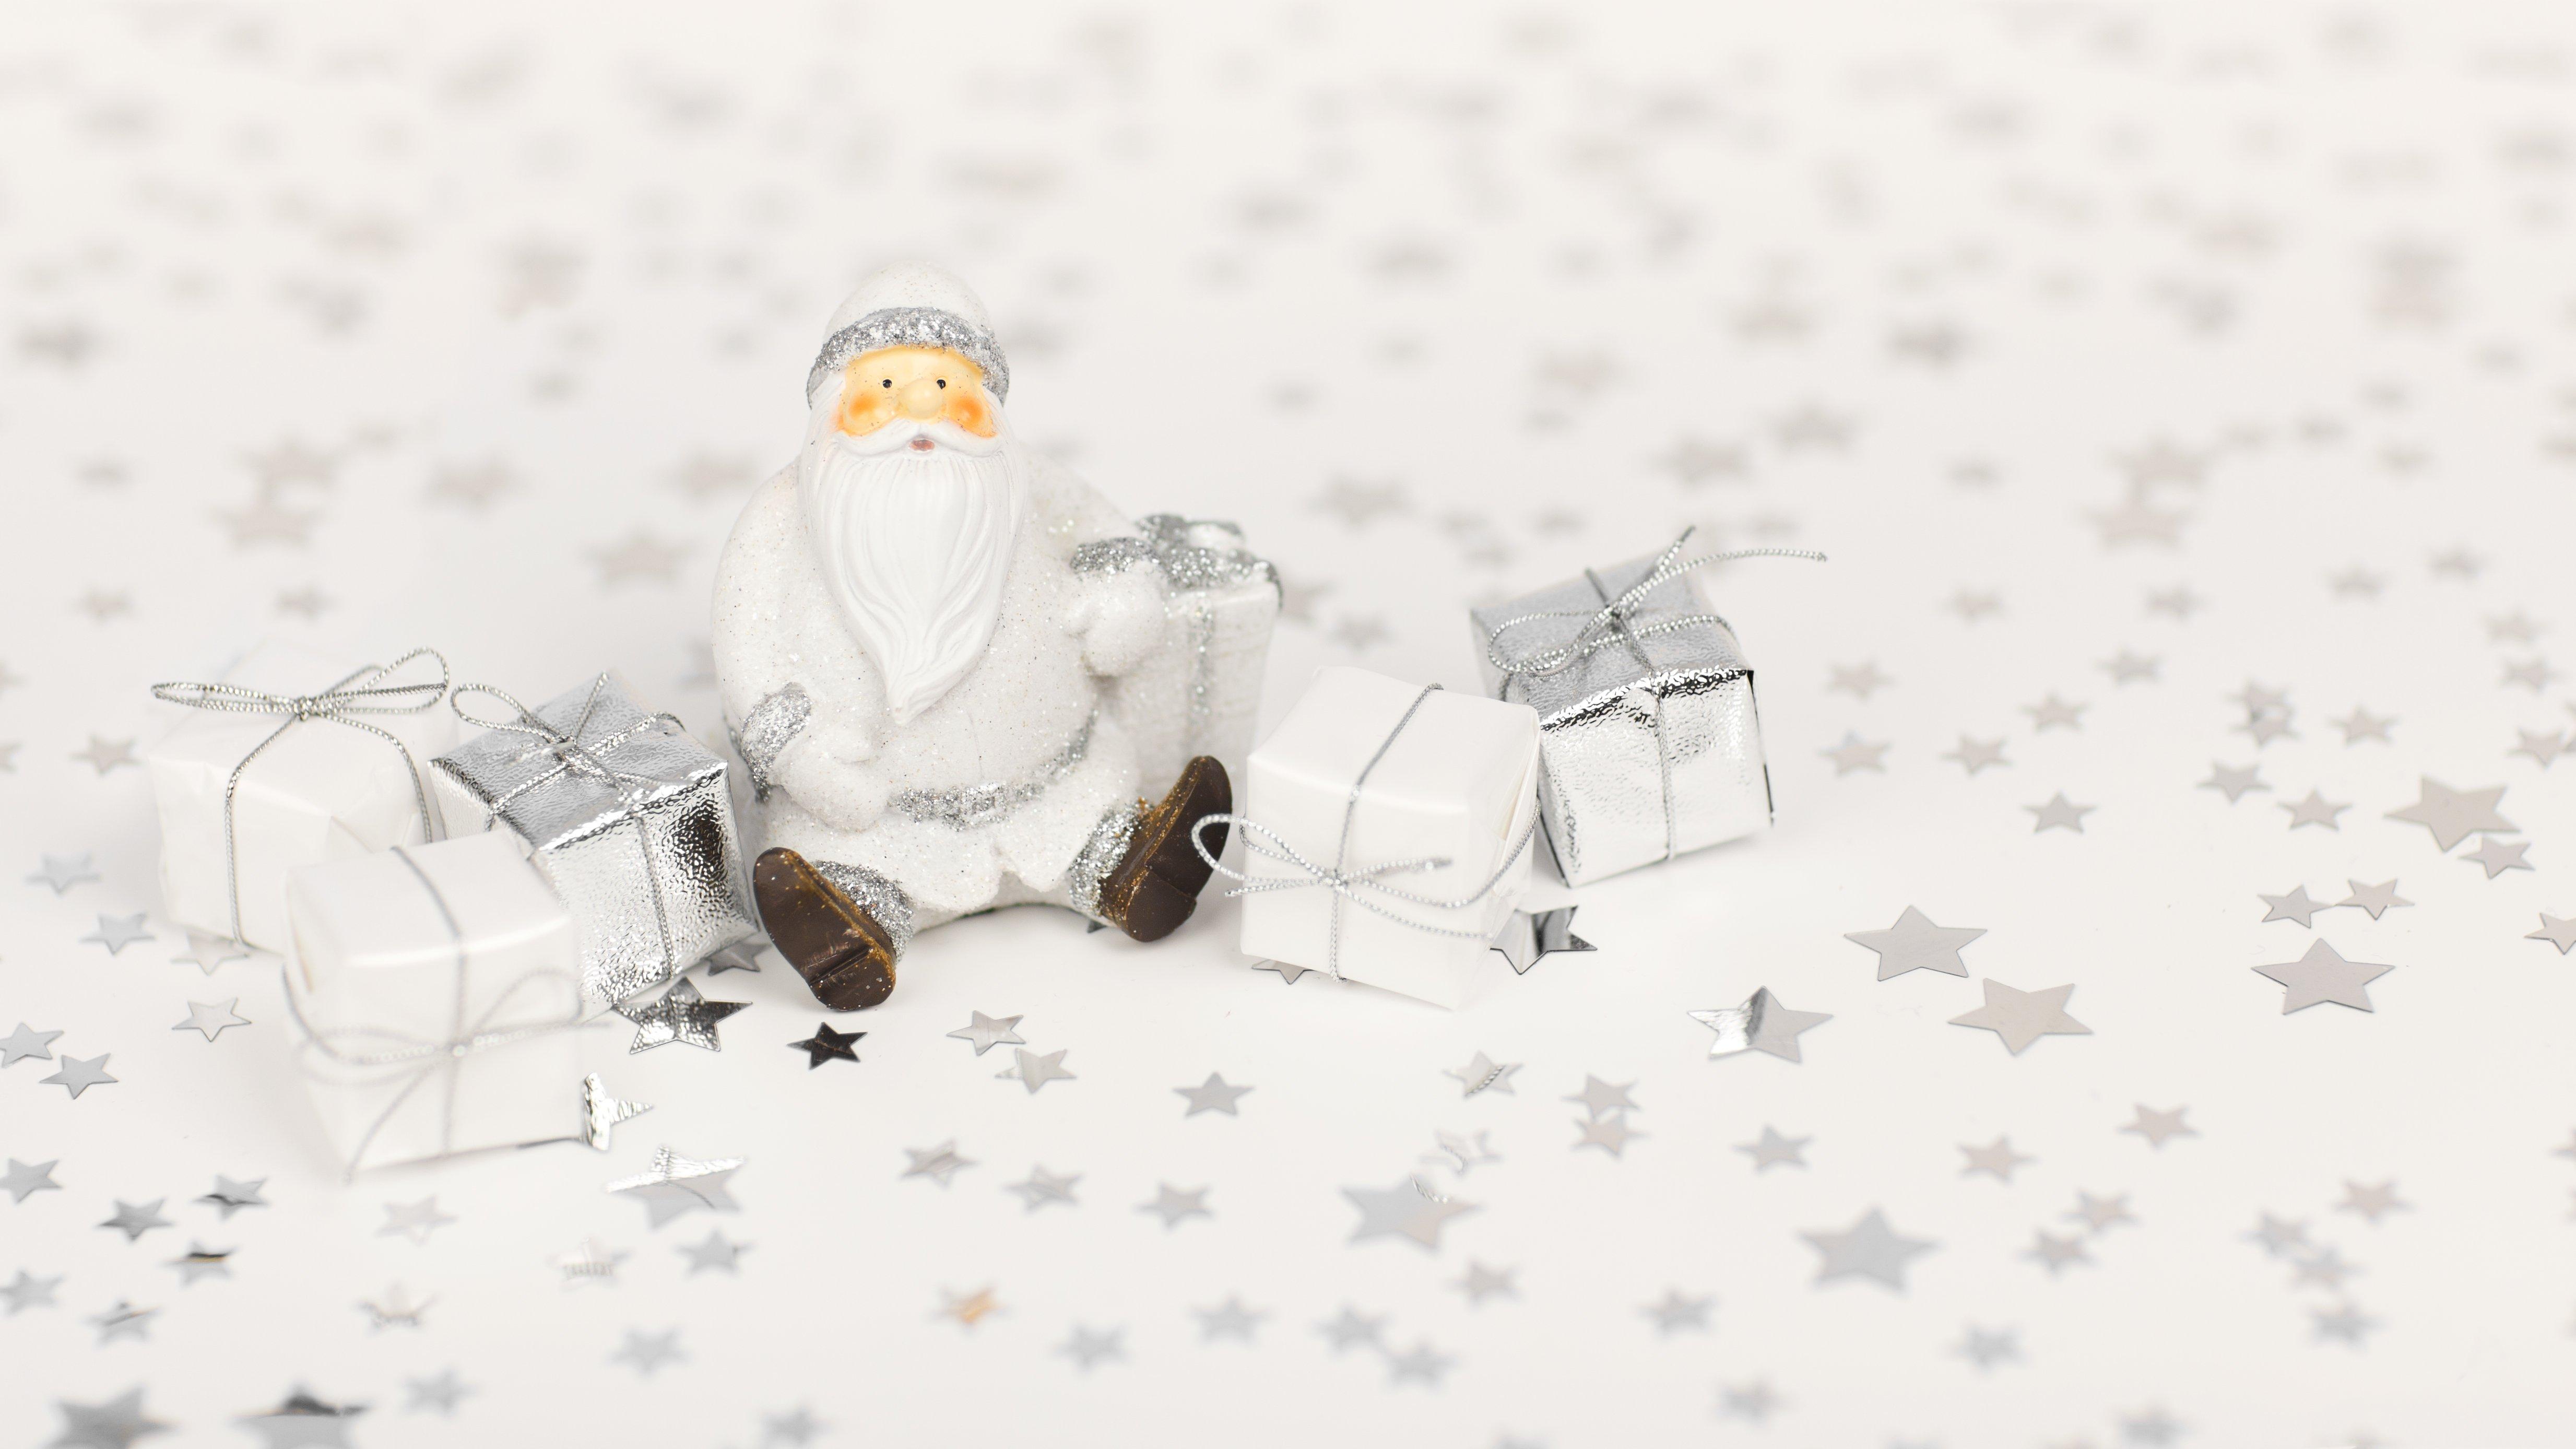 Gambar Tangan Orang Musim Dingin Putih Bintang Perayaan